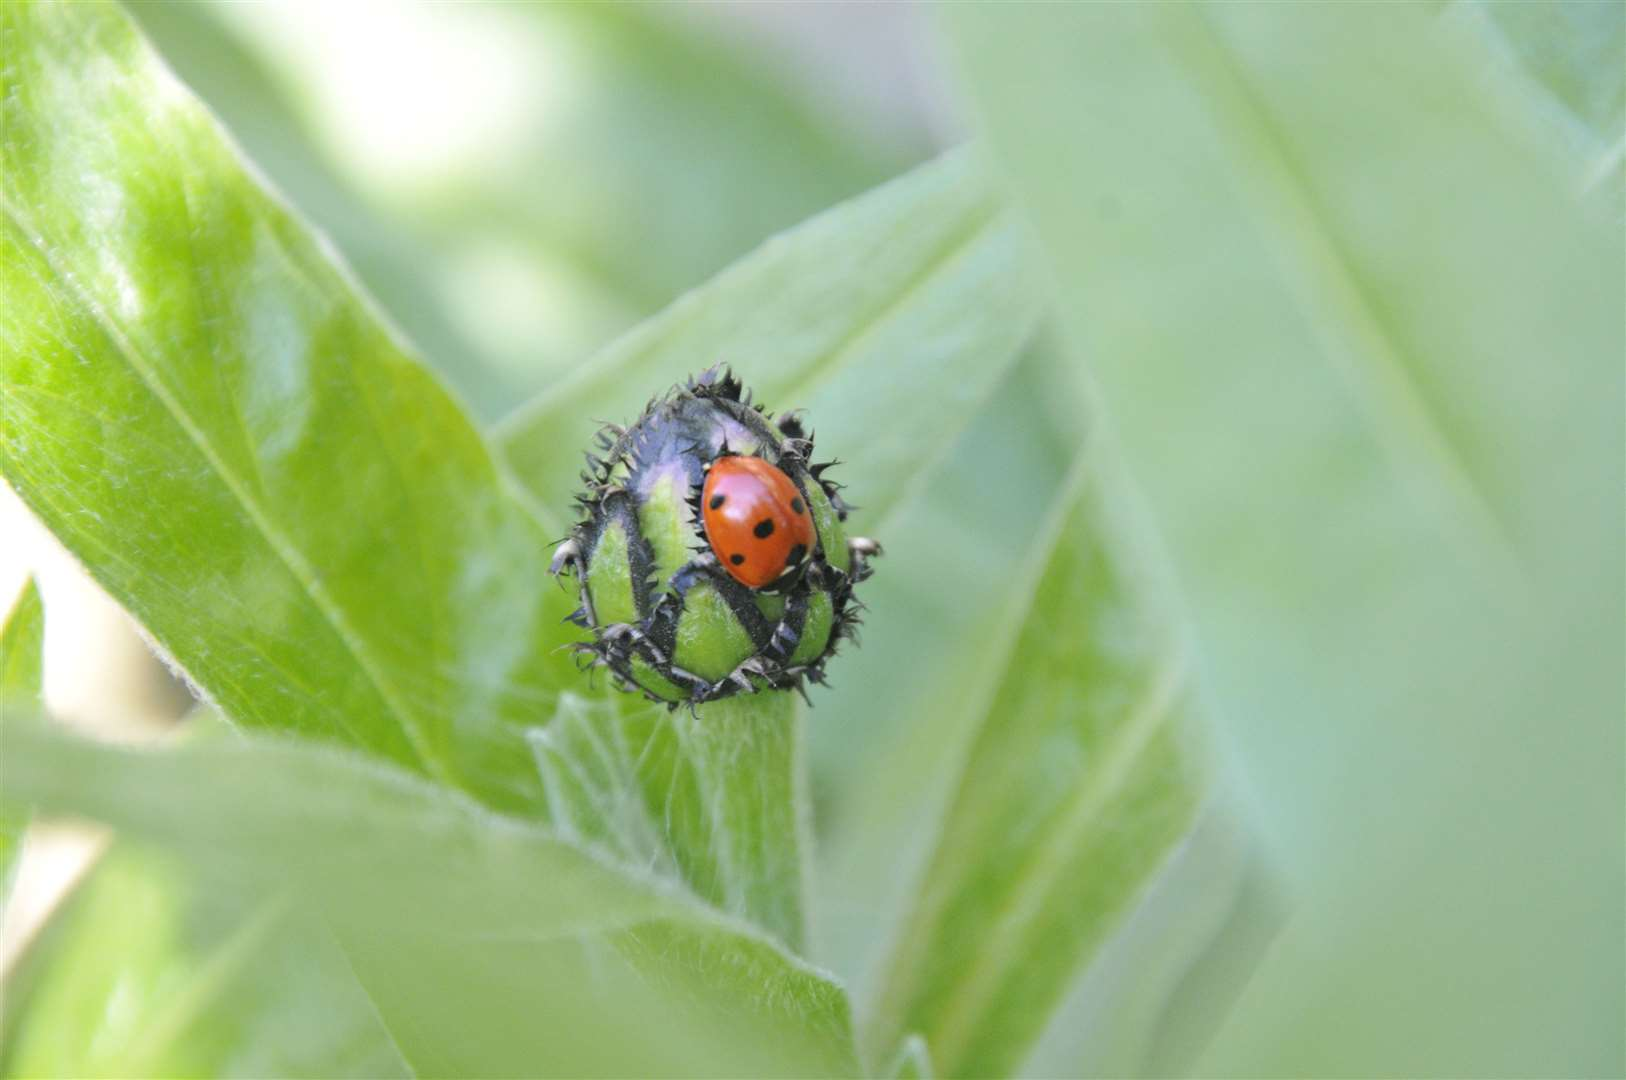 Seven-spot ladybird on cornflower bud (32231652)